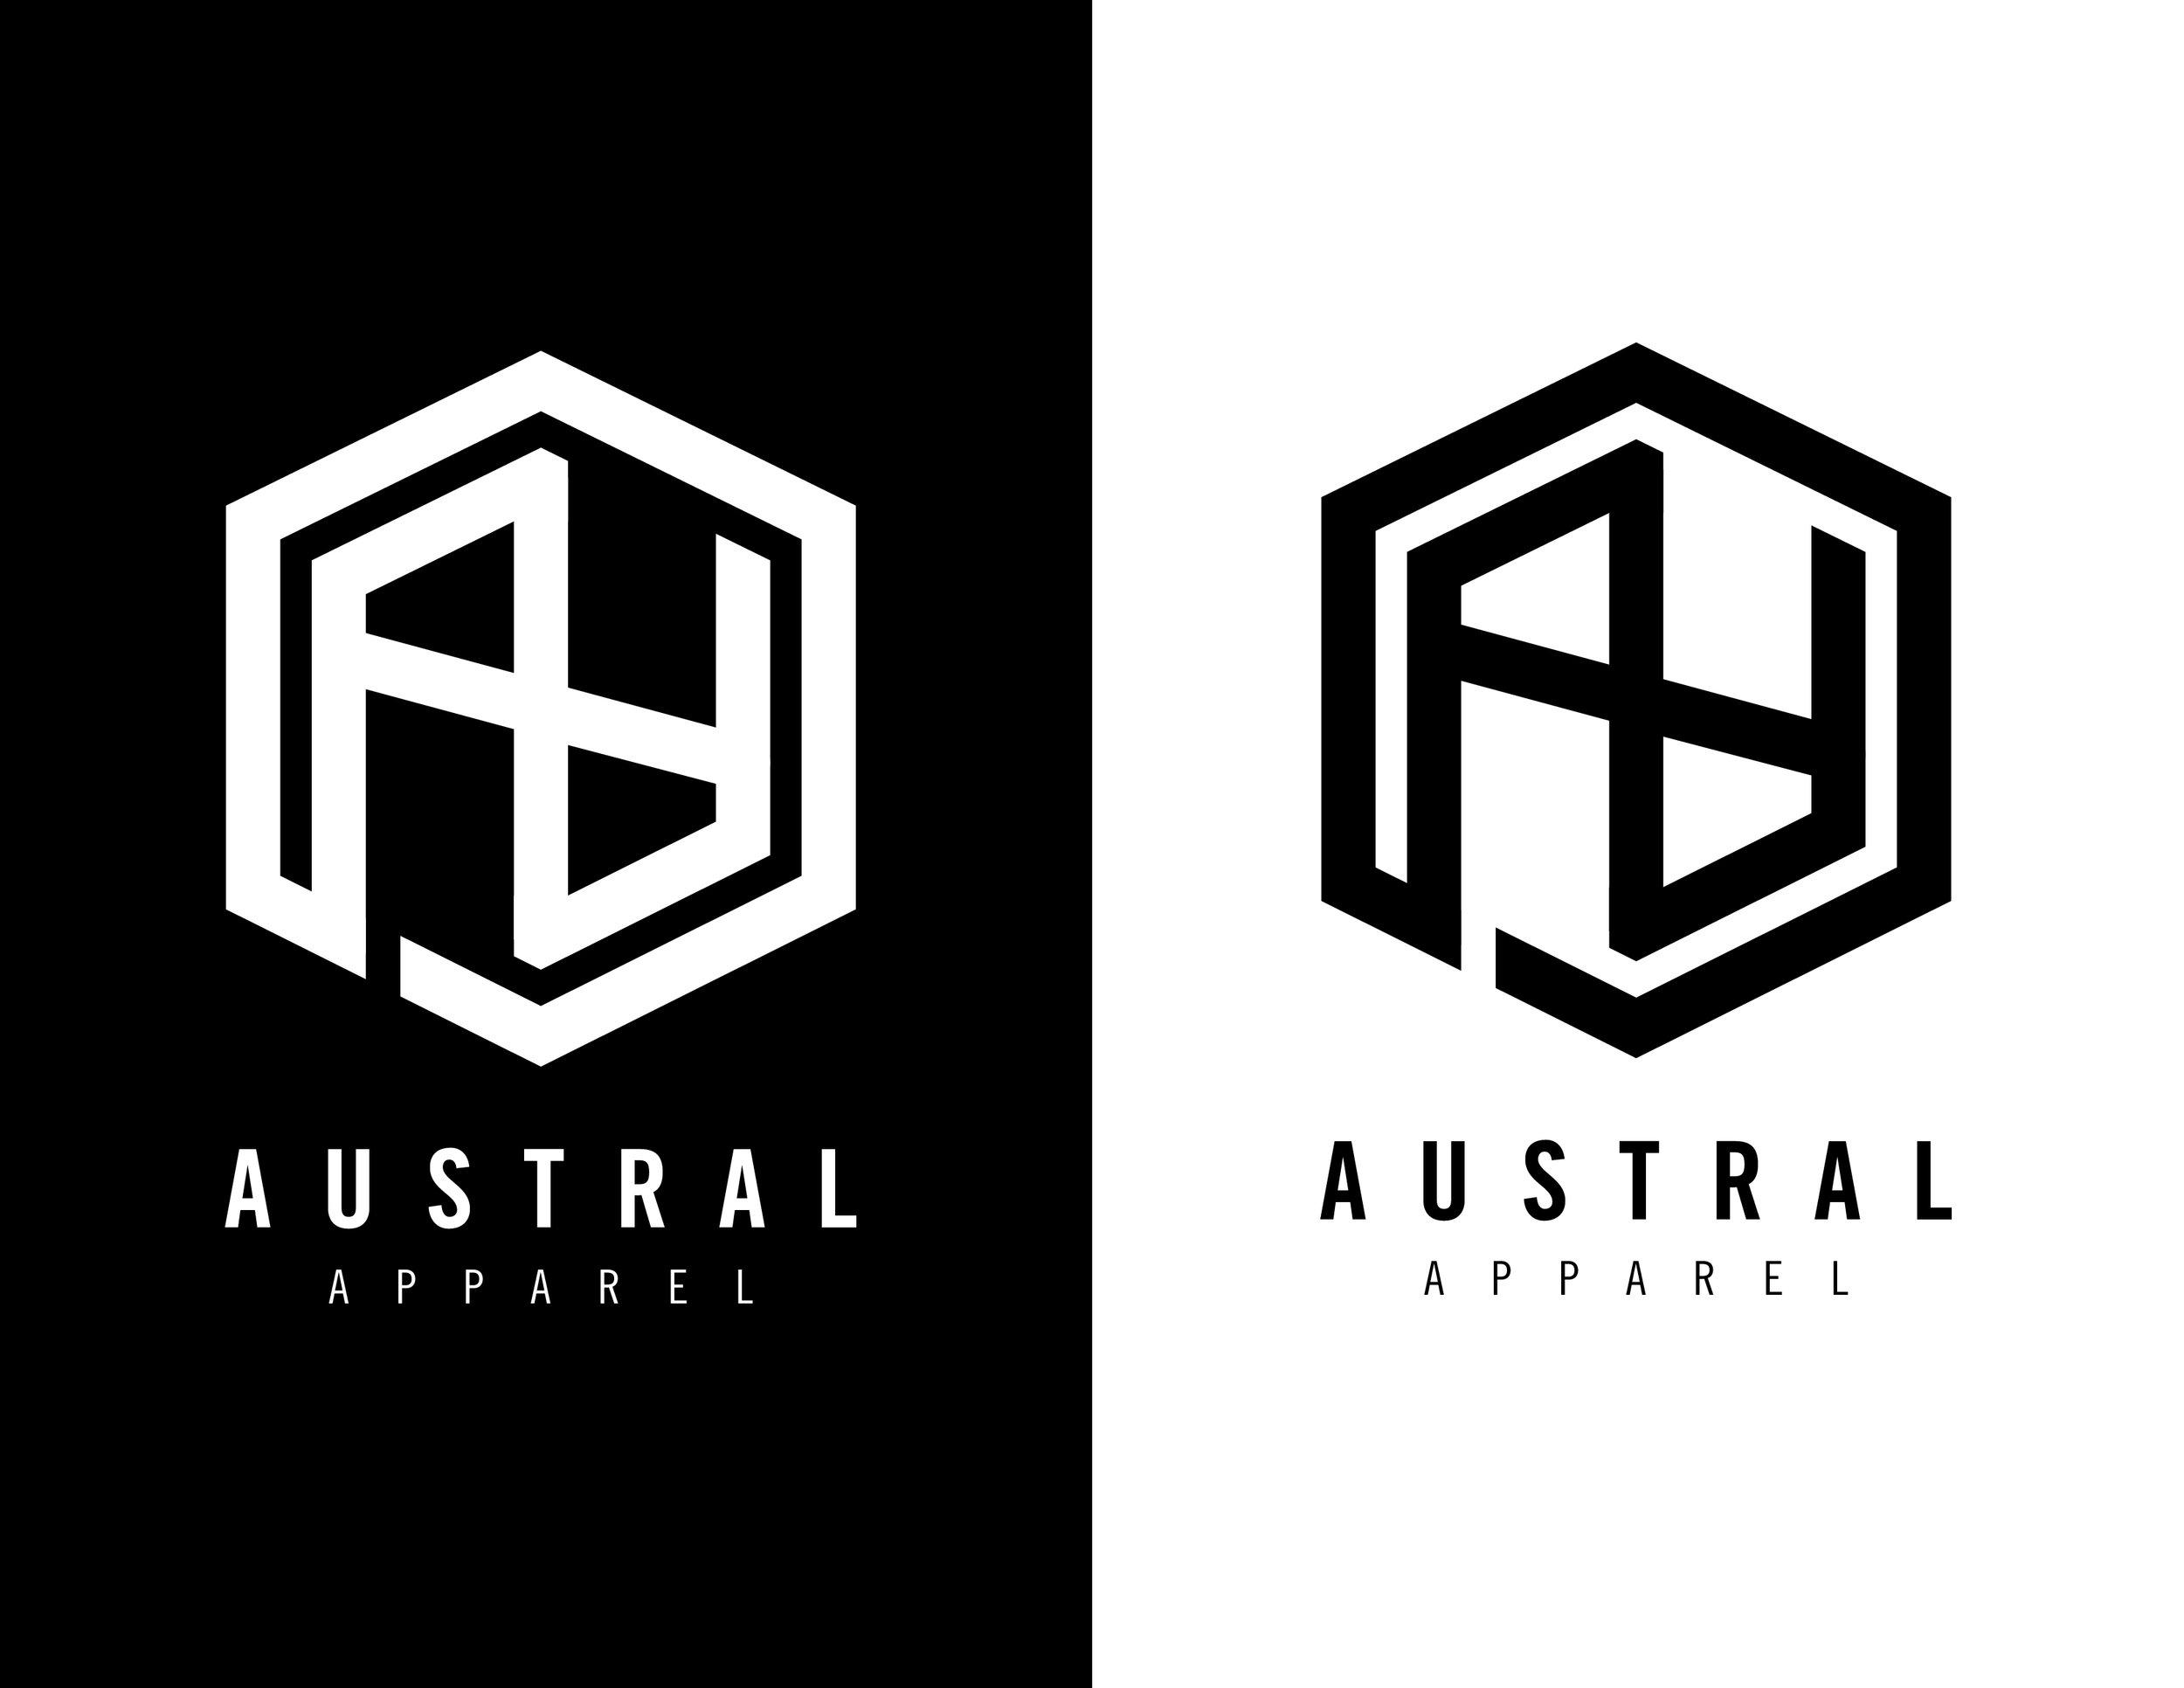 Austral Apparel.jpg